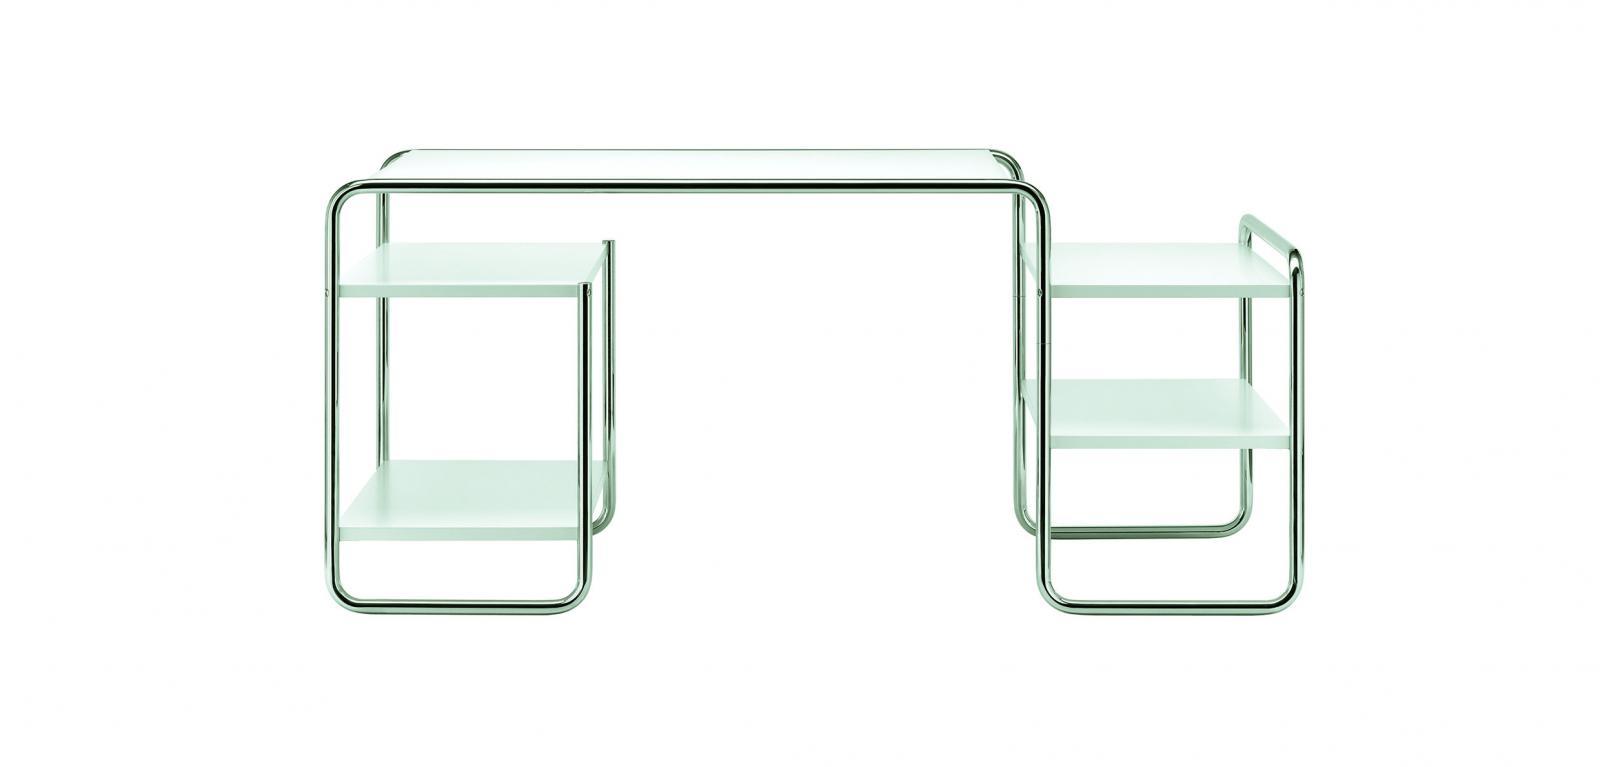 100 лет дизайна: стол S 285 Марселя Бройера